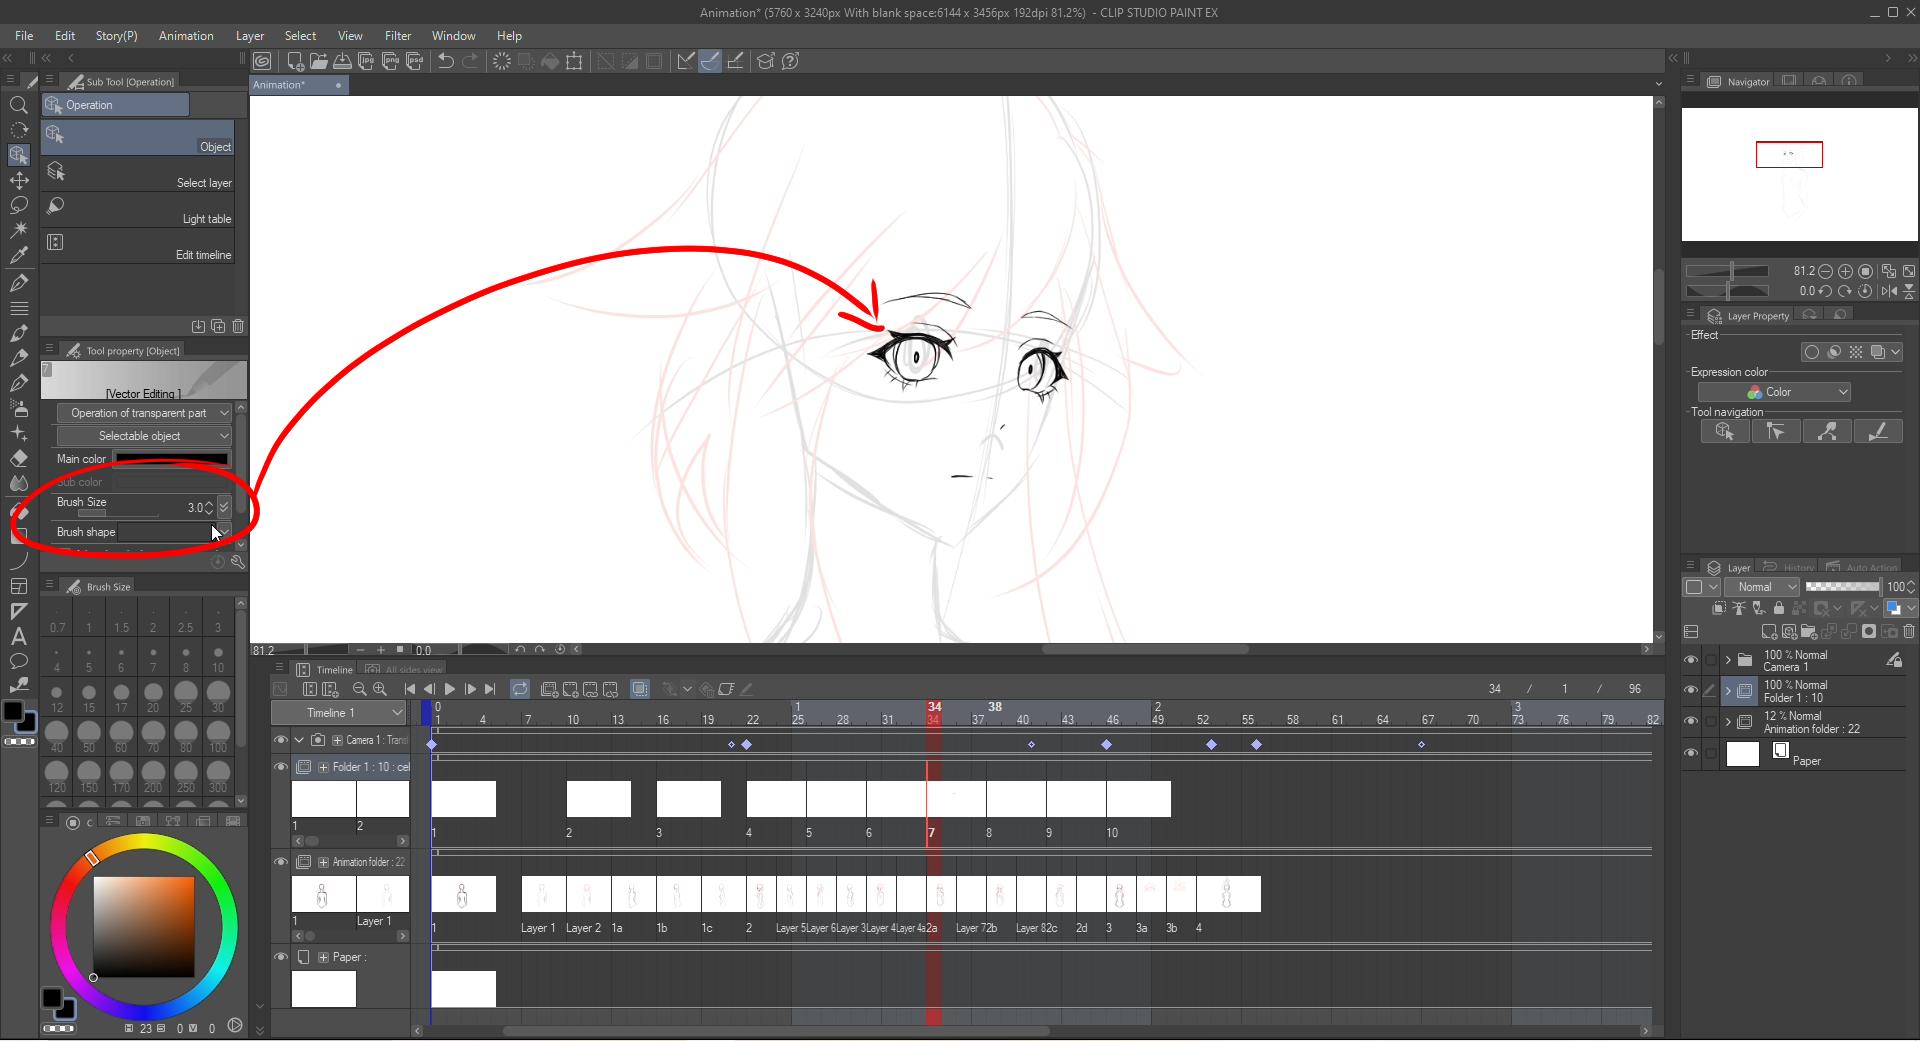 Line art for animation by miakia - CLIP STUDIO TIPS